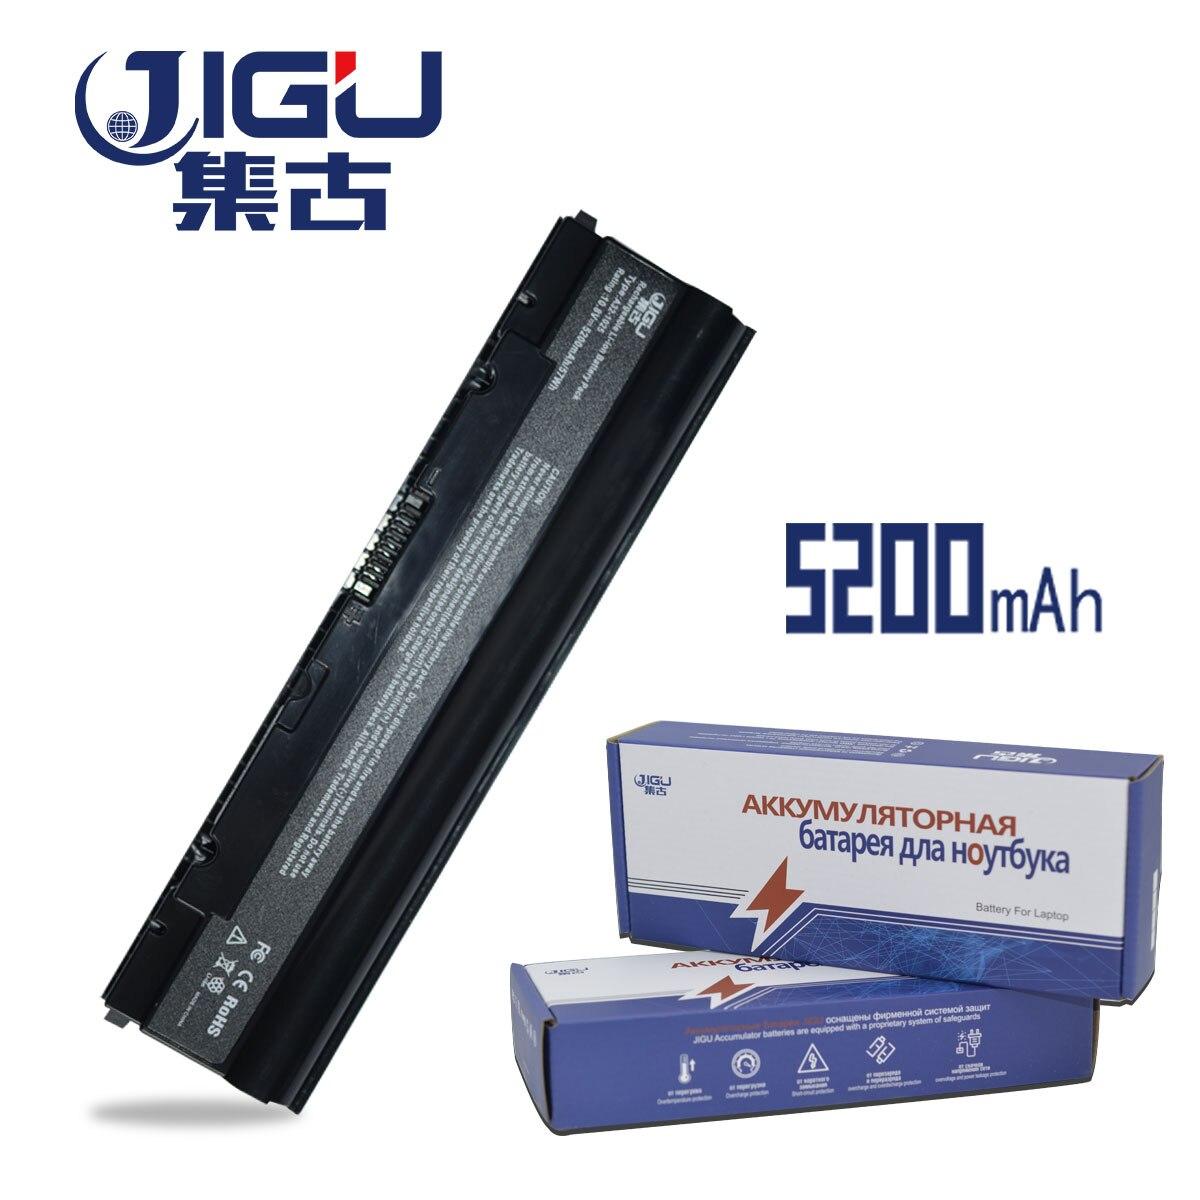 JIGU Laptop Battery For ASUS A31-1025b 07G016HF1875 A31-1025 A31-1025c Eee PC 1025C 1225B R052 1025 EeePC 1011CX 1225C RO52C